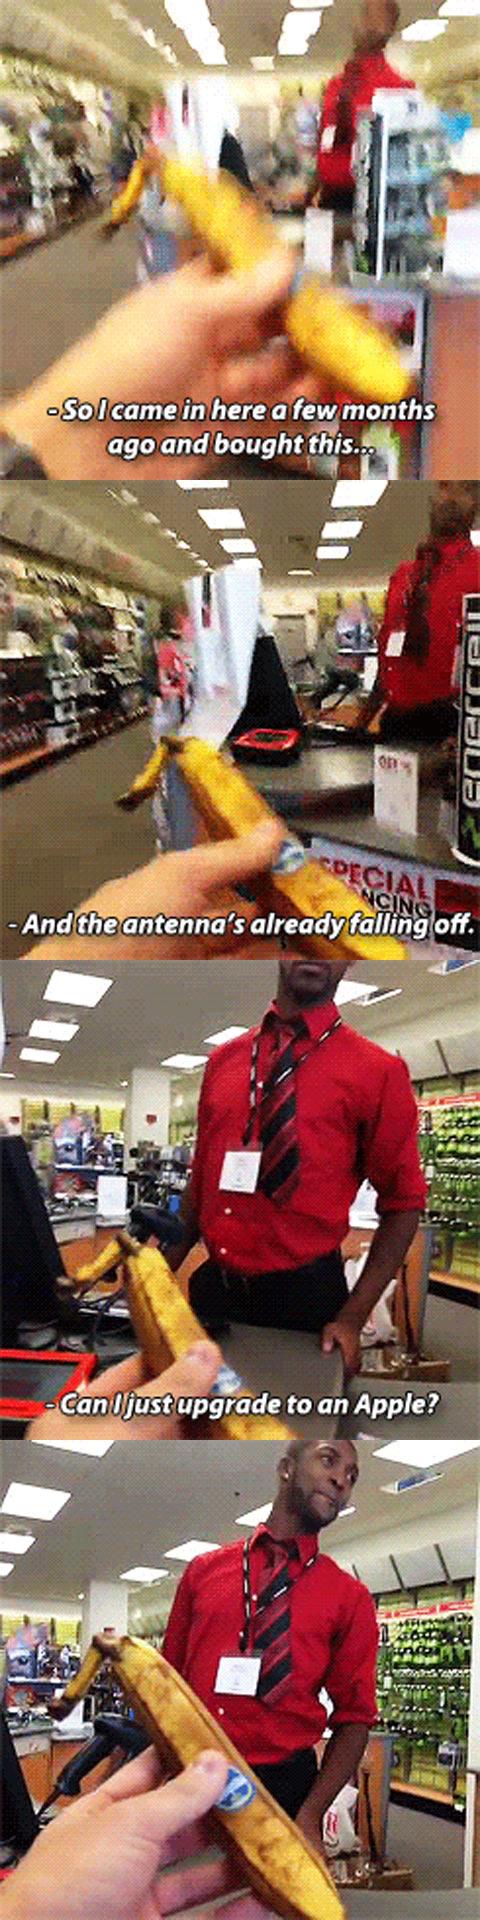 funny-store-banana-apple-change